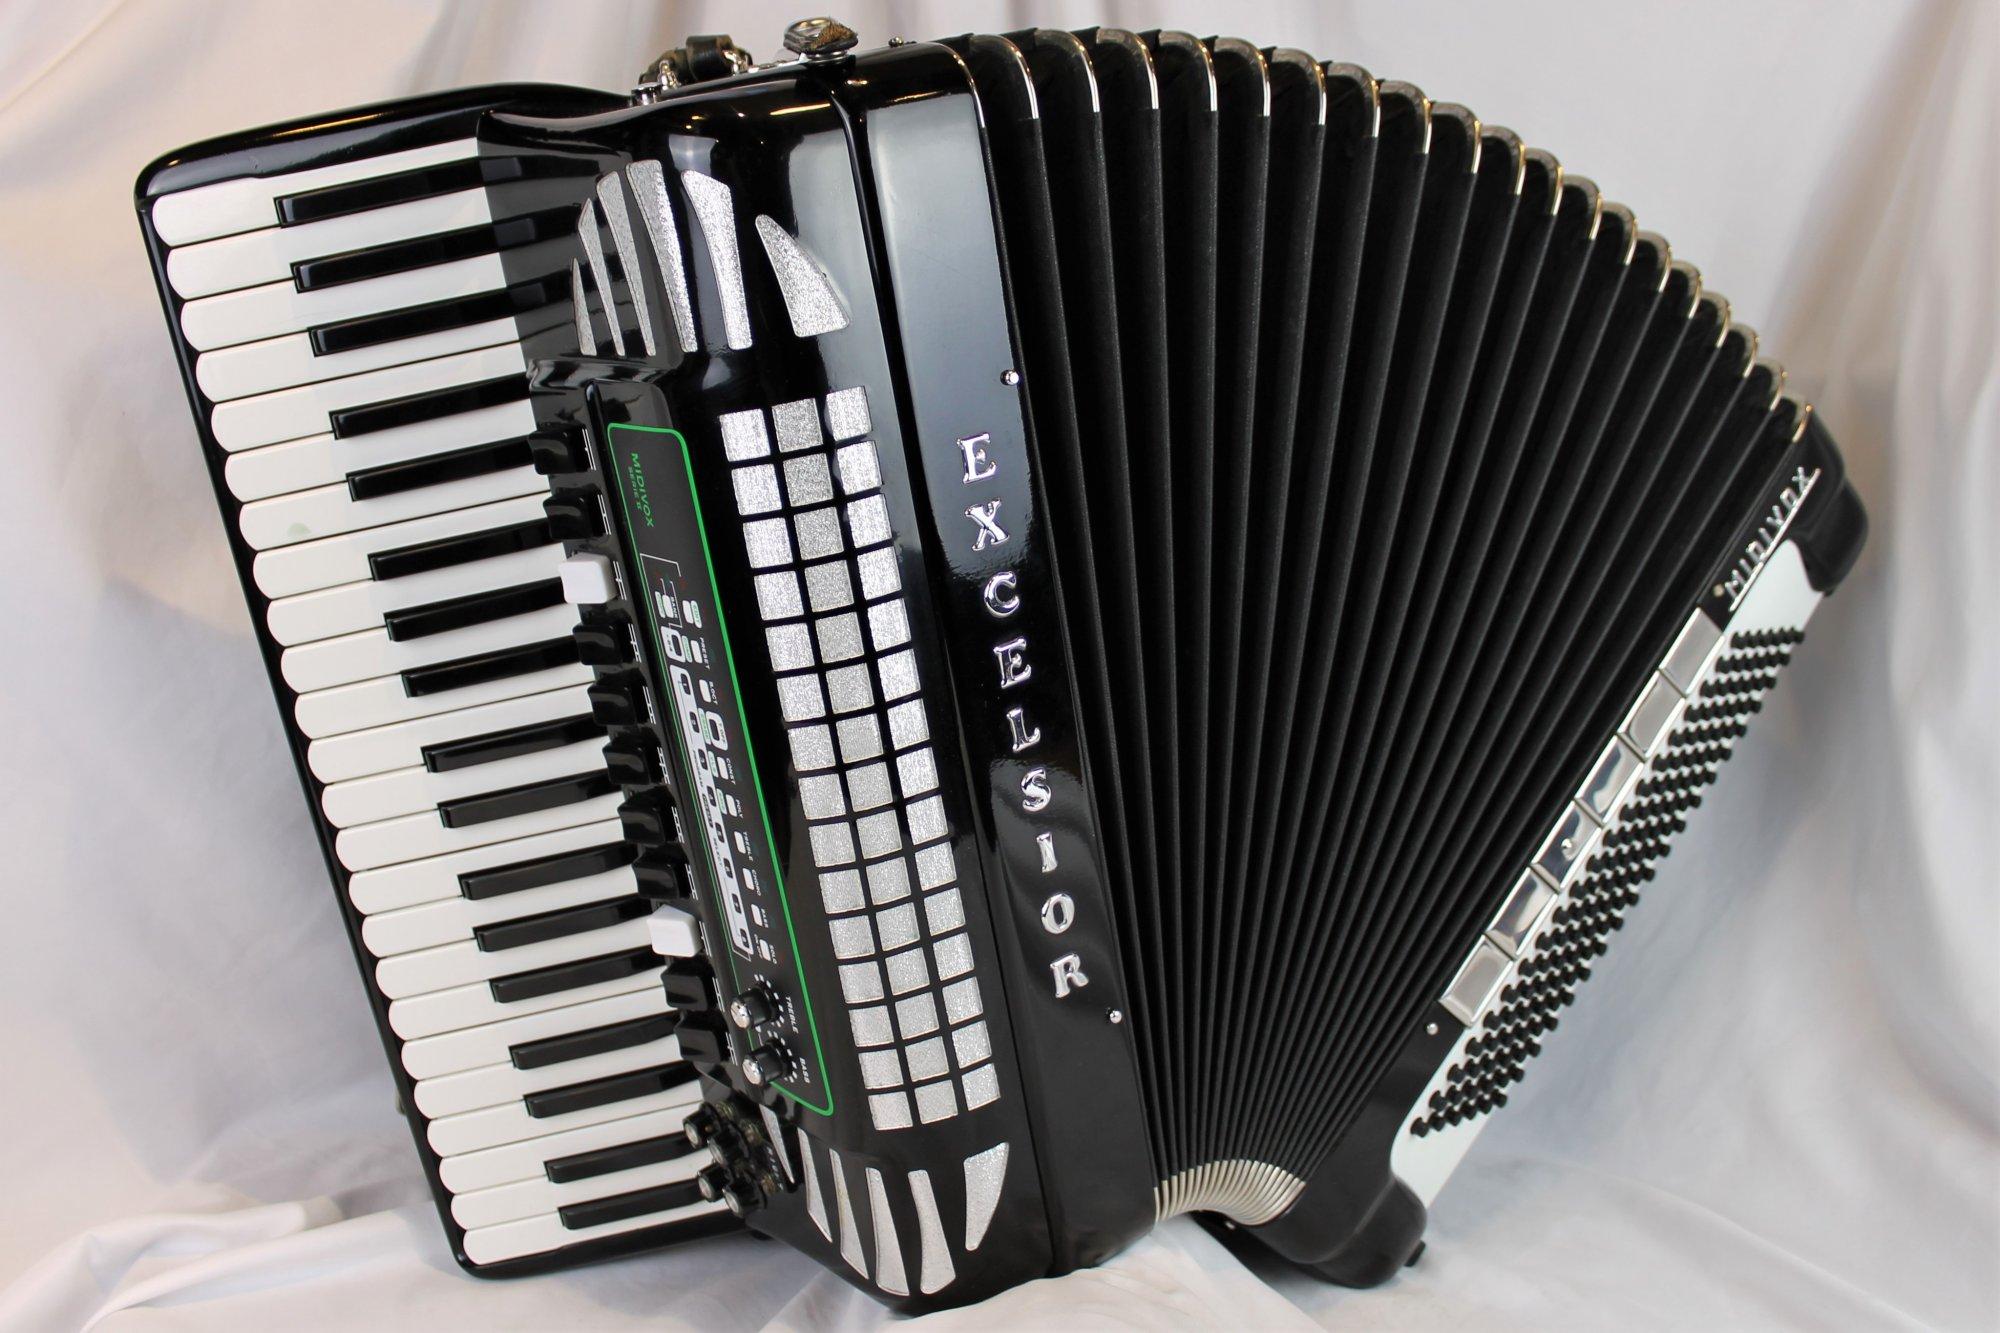 4872 - Black Excelsior Midivox II 911 Piano Accordion LMMM 41 120